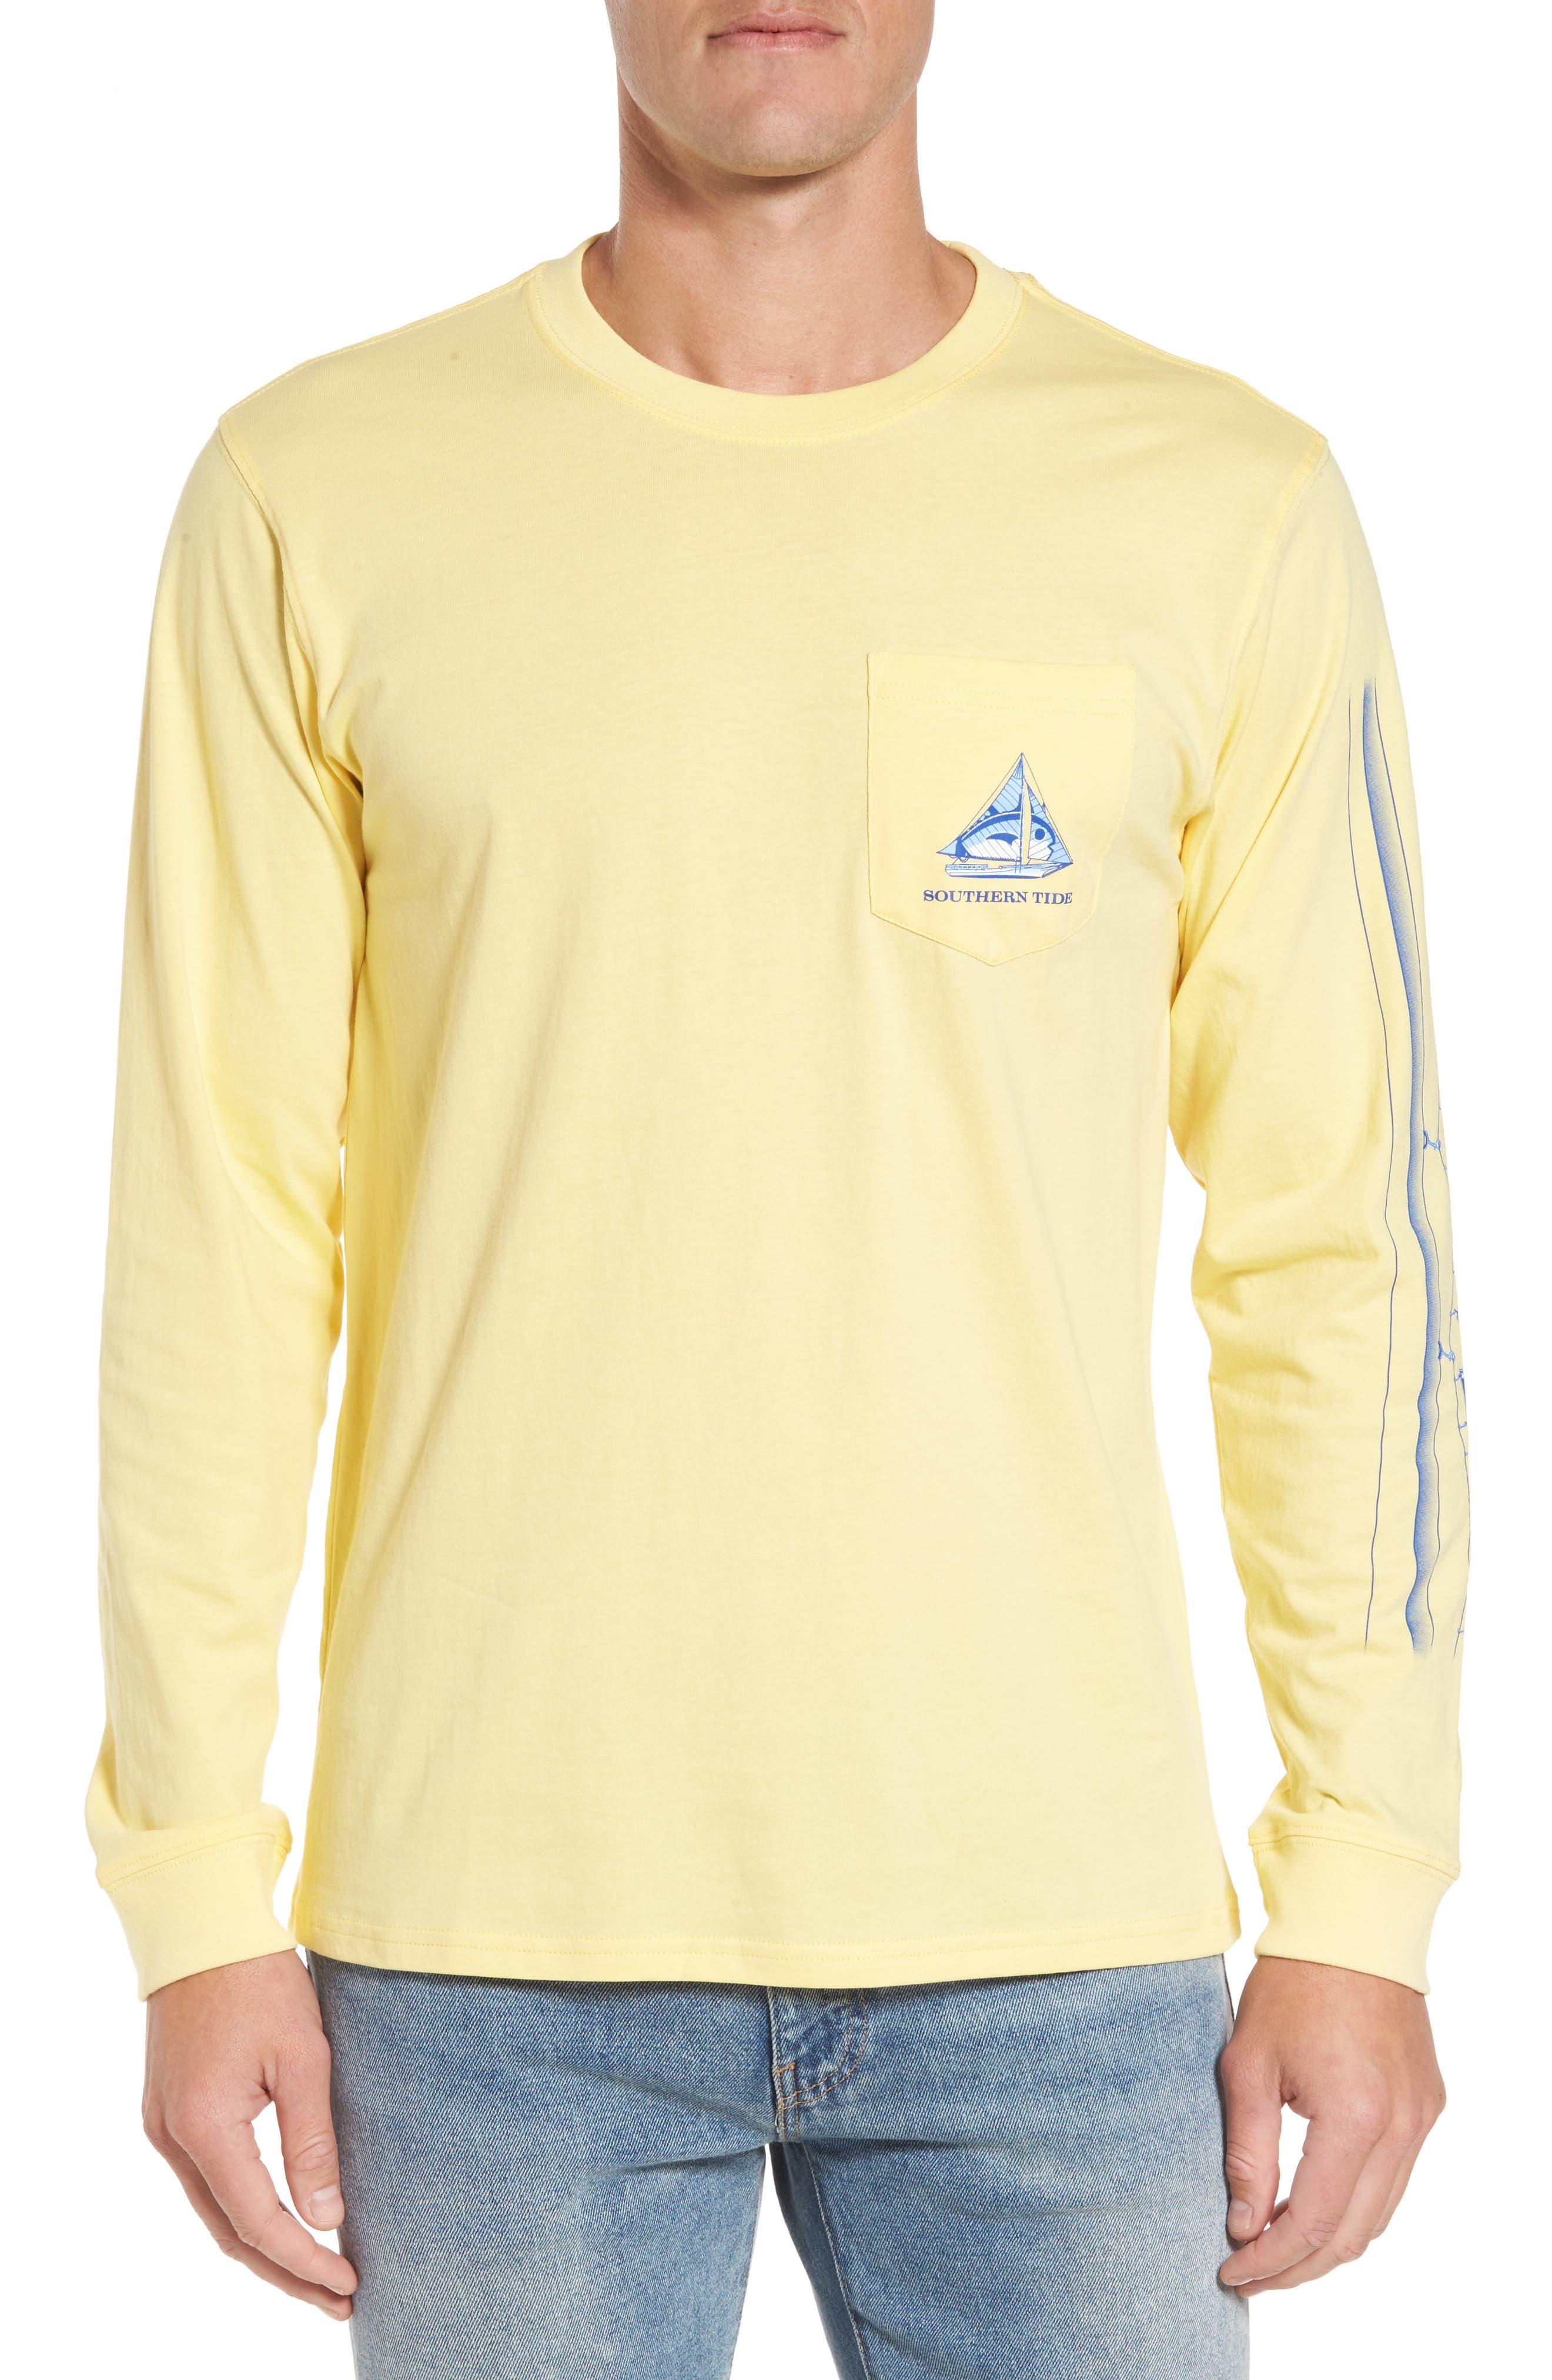 Main Image - Southern Tide Sailboat Classic T-Shirt